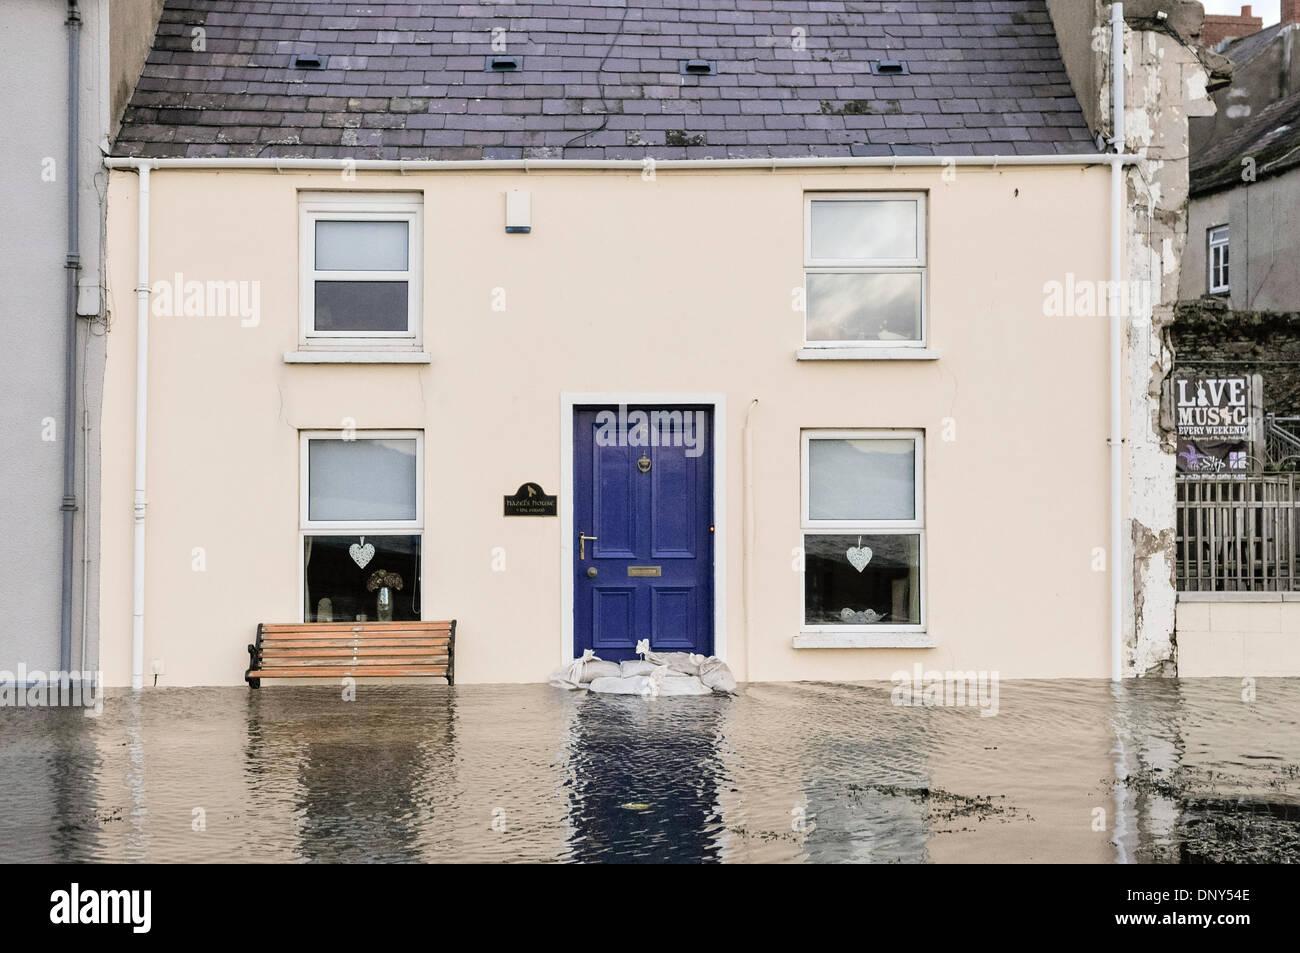 Portaferry, Northern Ireland. 6 Jan 2014 - A house narrowly avoids floodwater in Portaferry, Northern Ireland. The Stock Photo